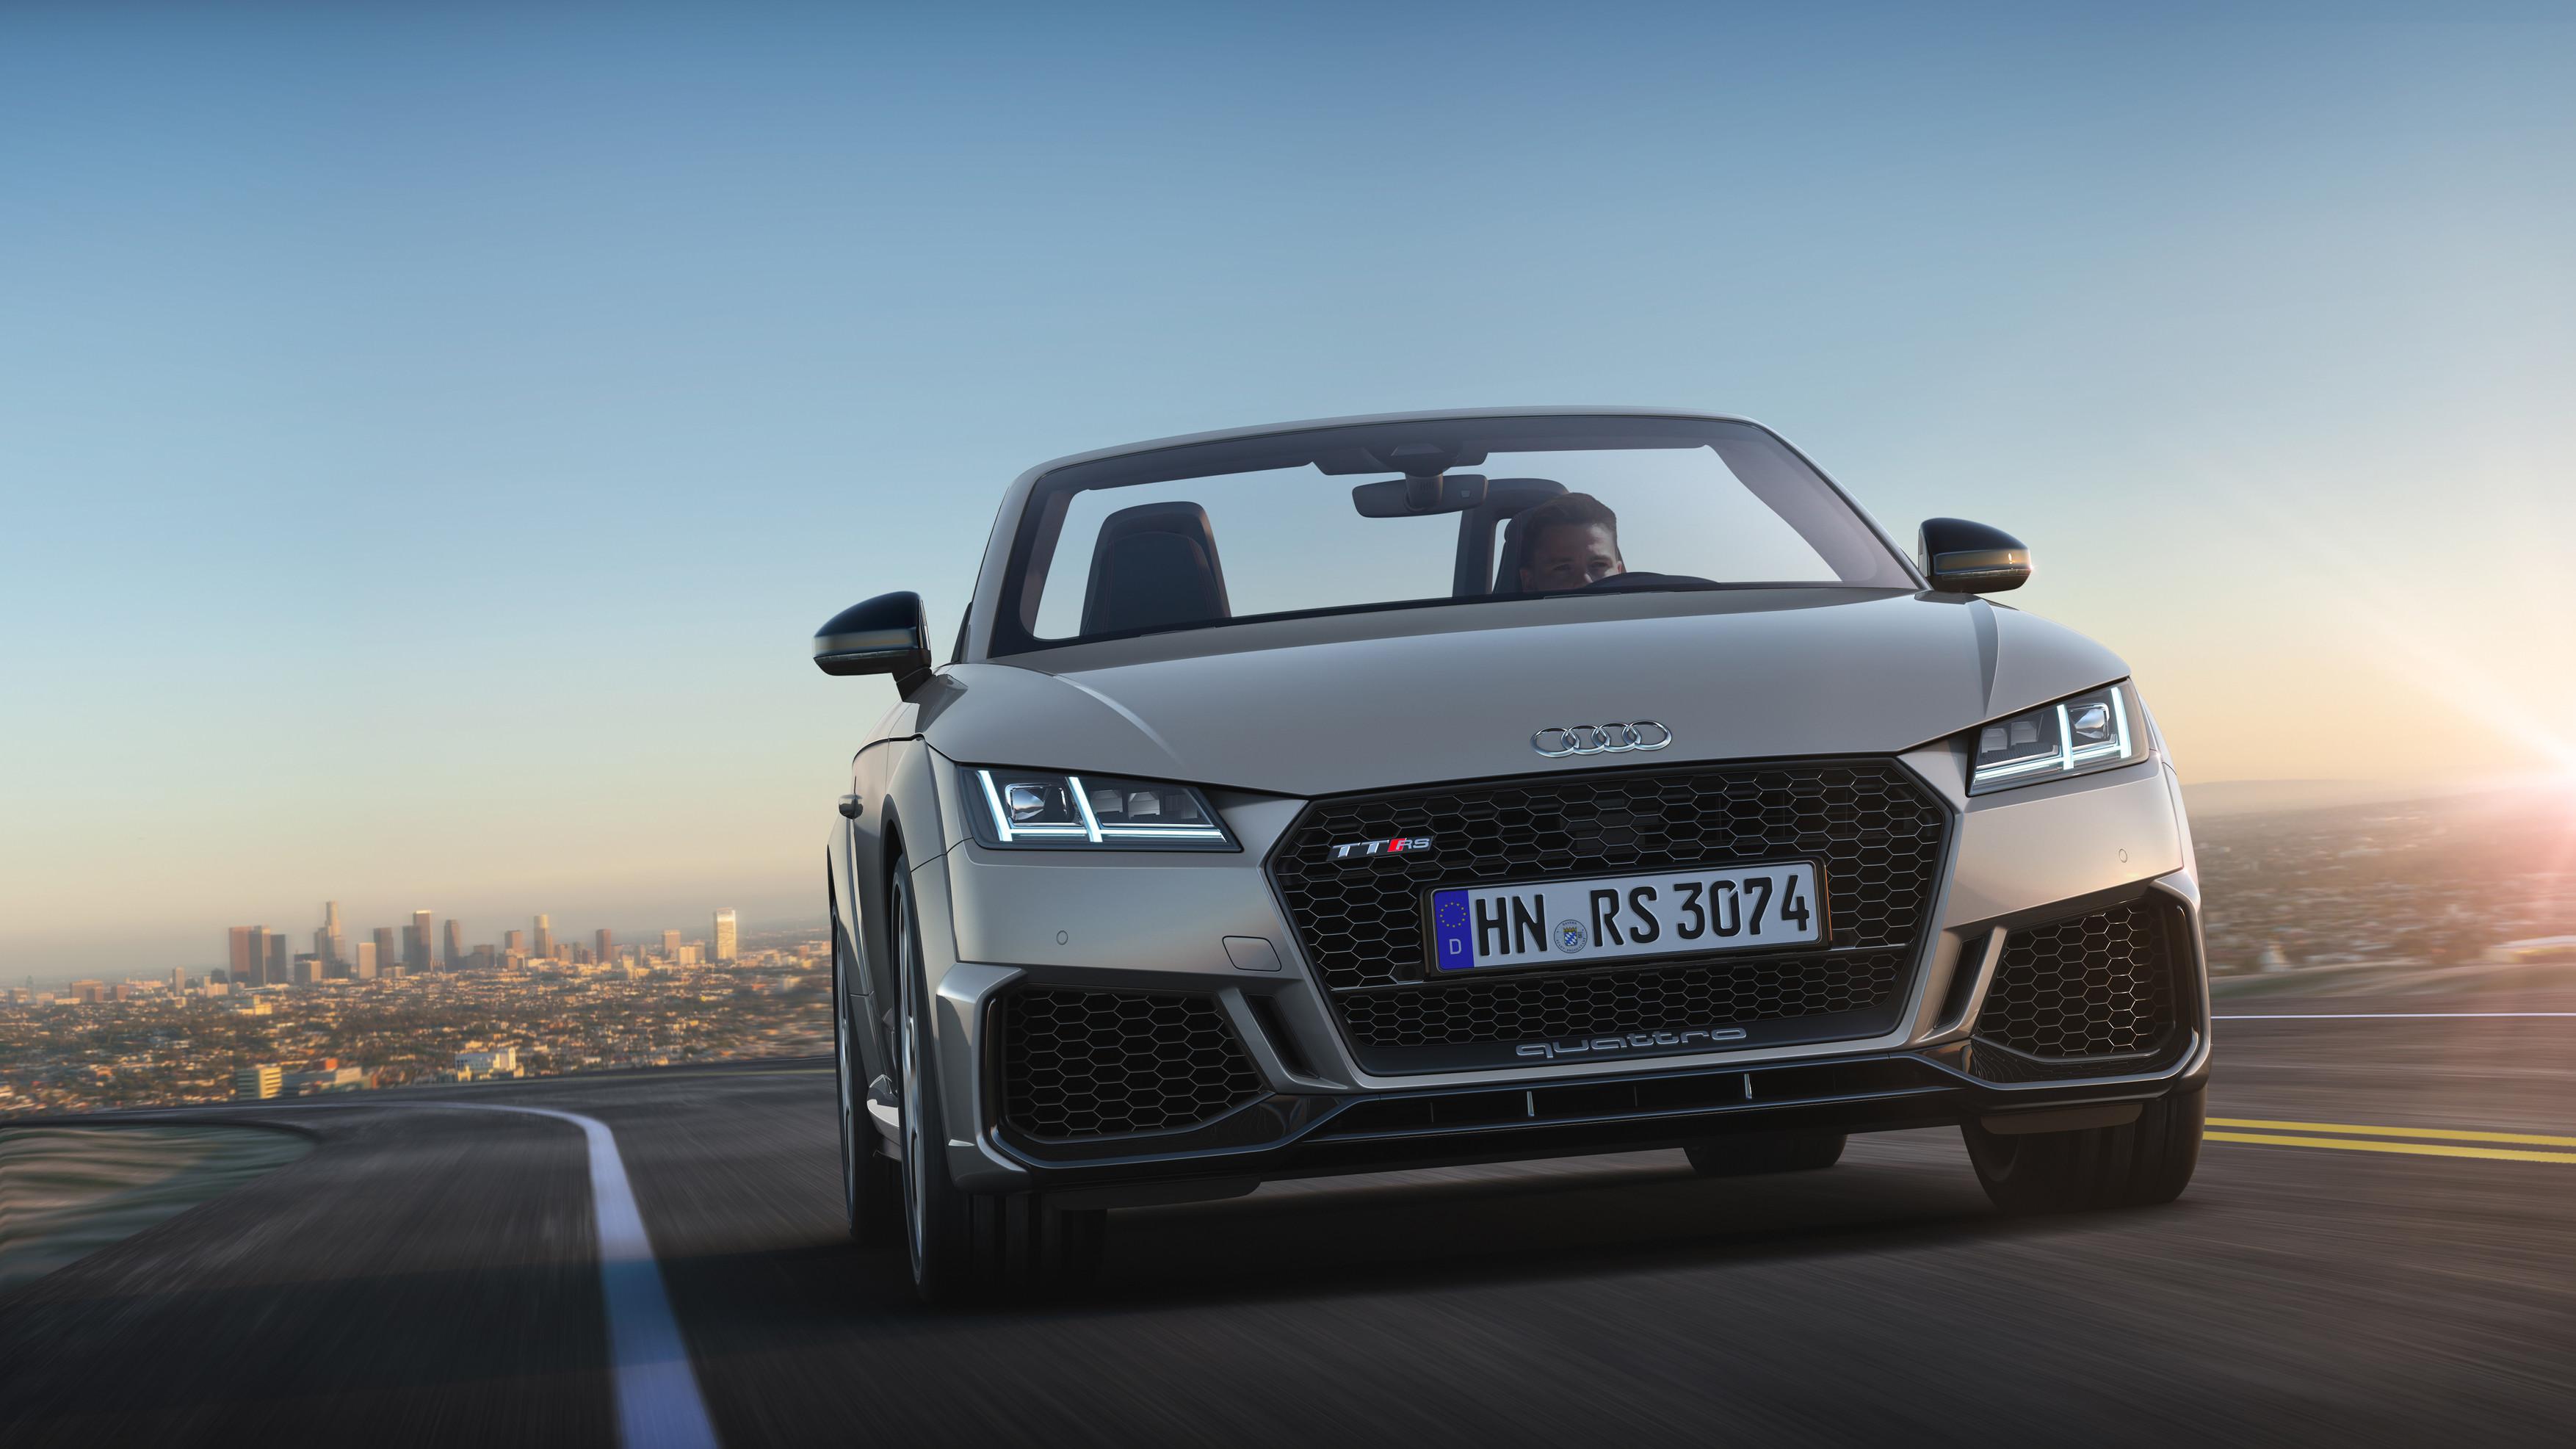 Kompaktsportler in Topform:  das neue Audi TT RS Coupé und Roadster